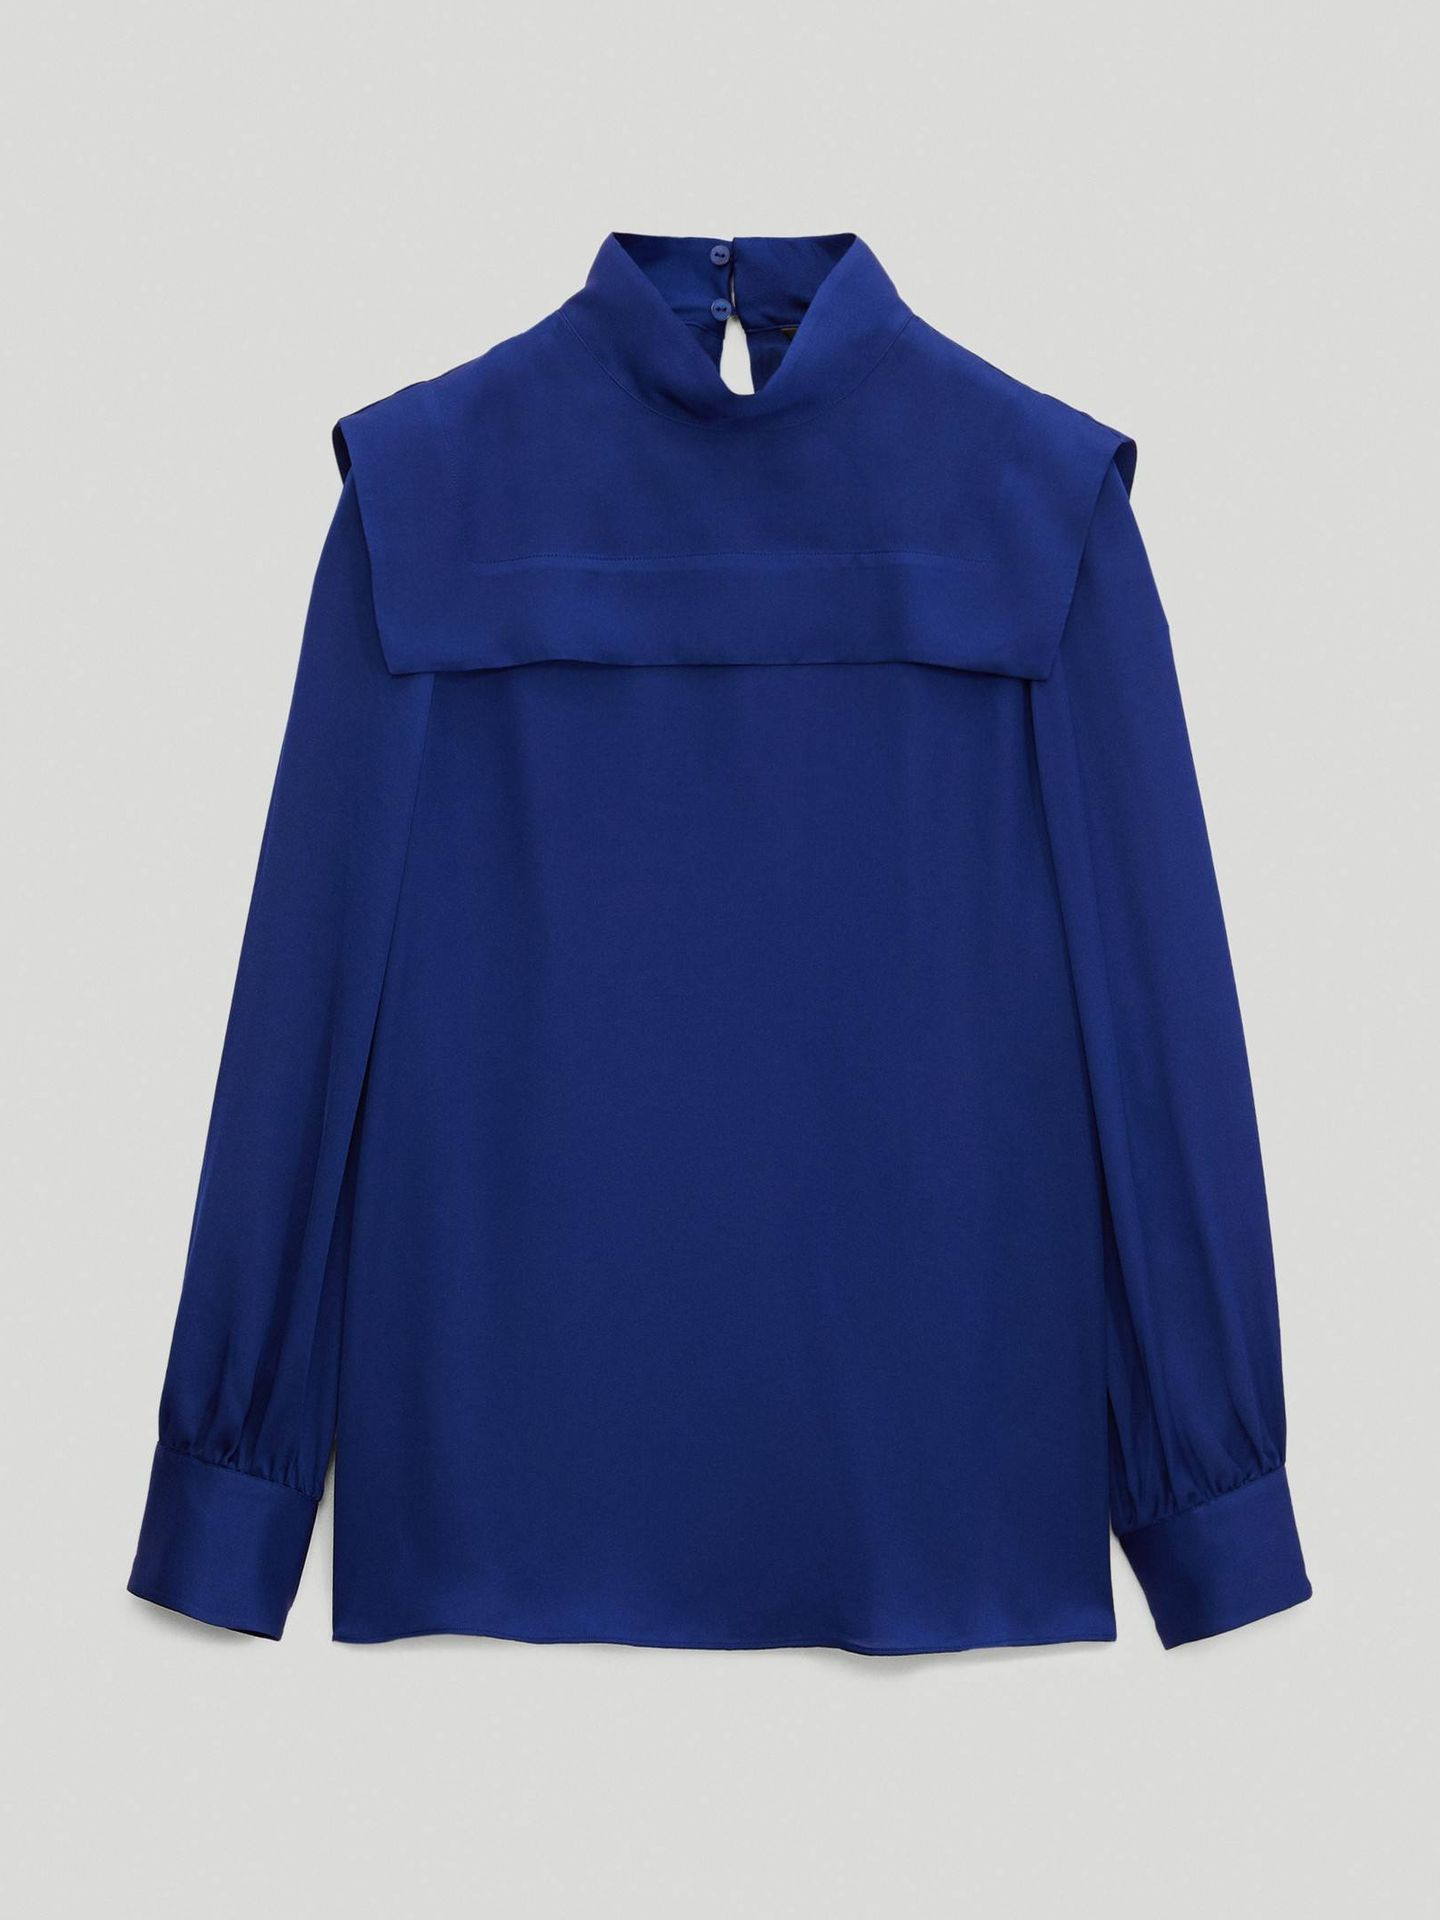 Camisa con pechera de Massimo Dutti. (Cortesía)